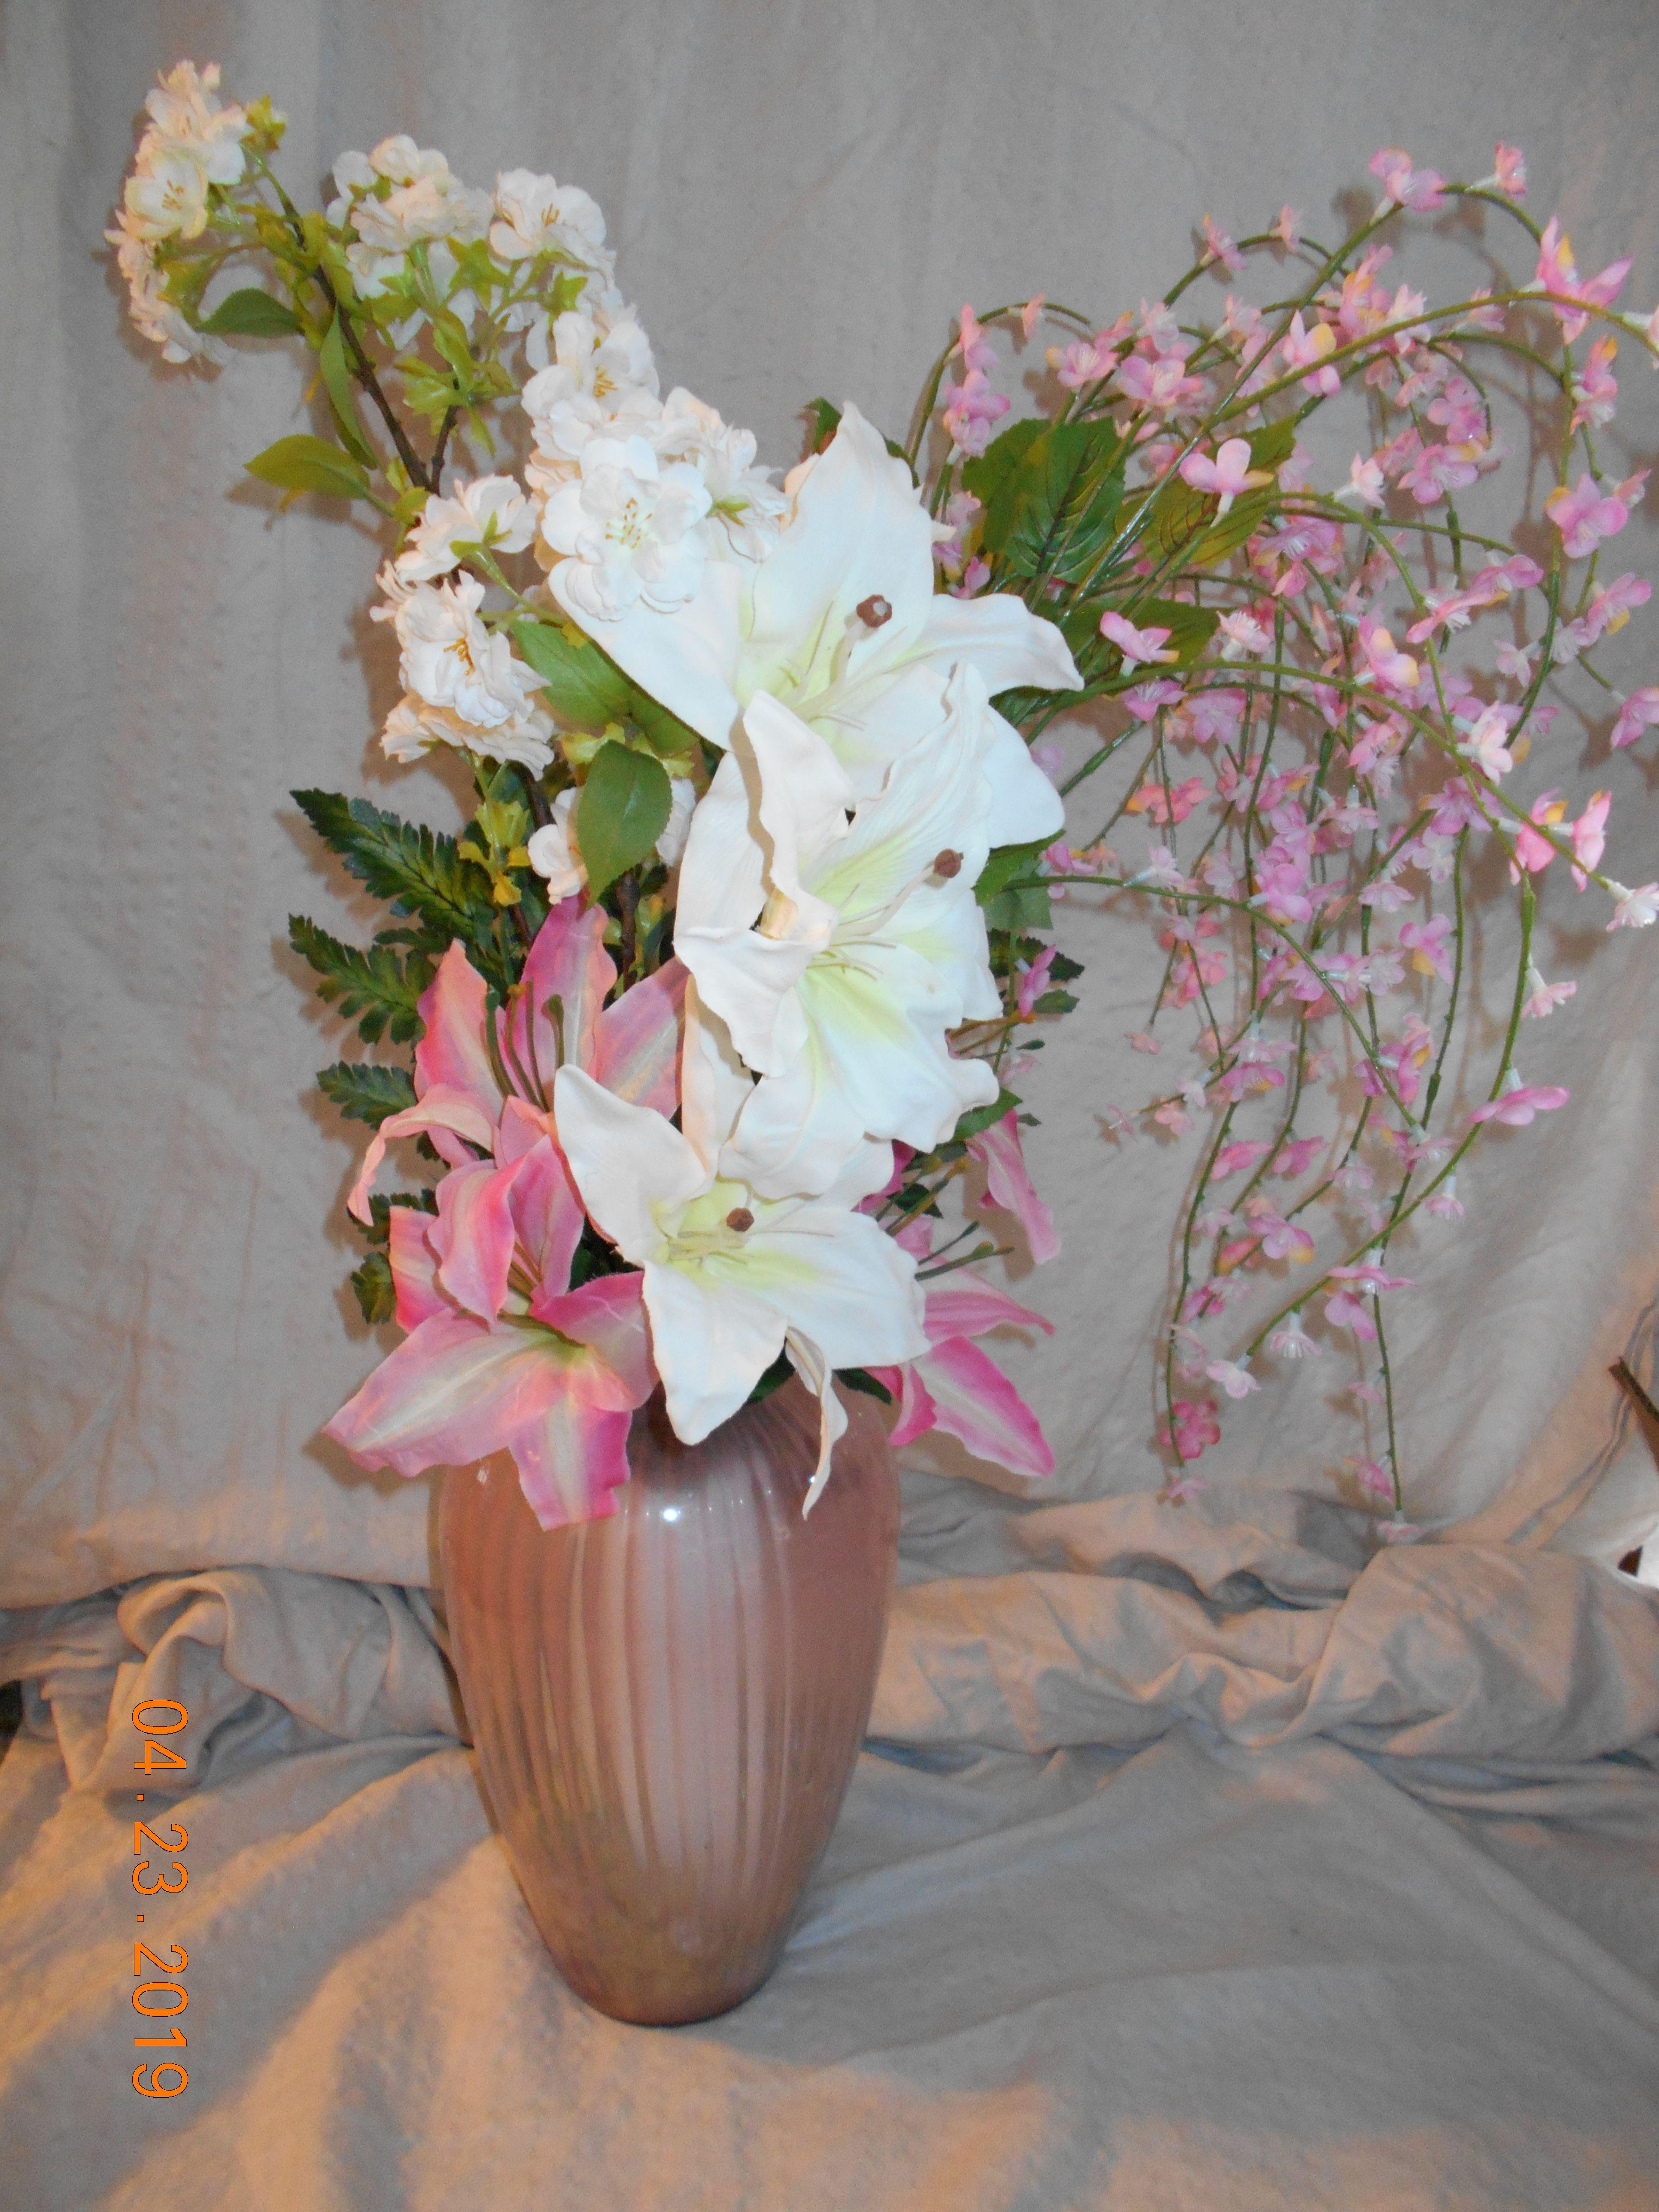 large pink vase with pink & white flowers Pink vase